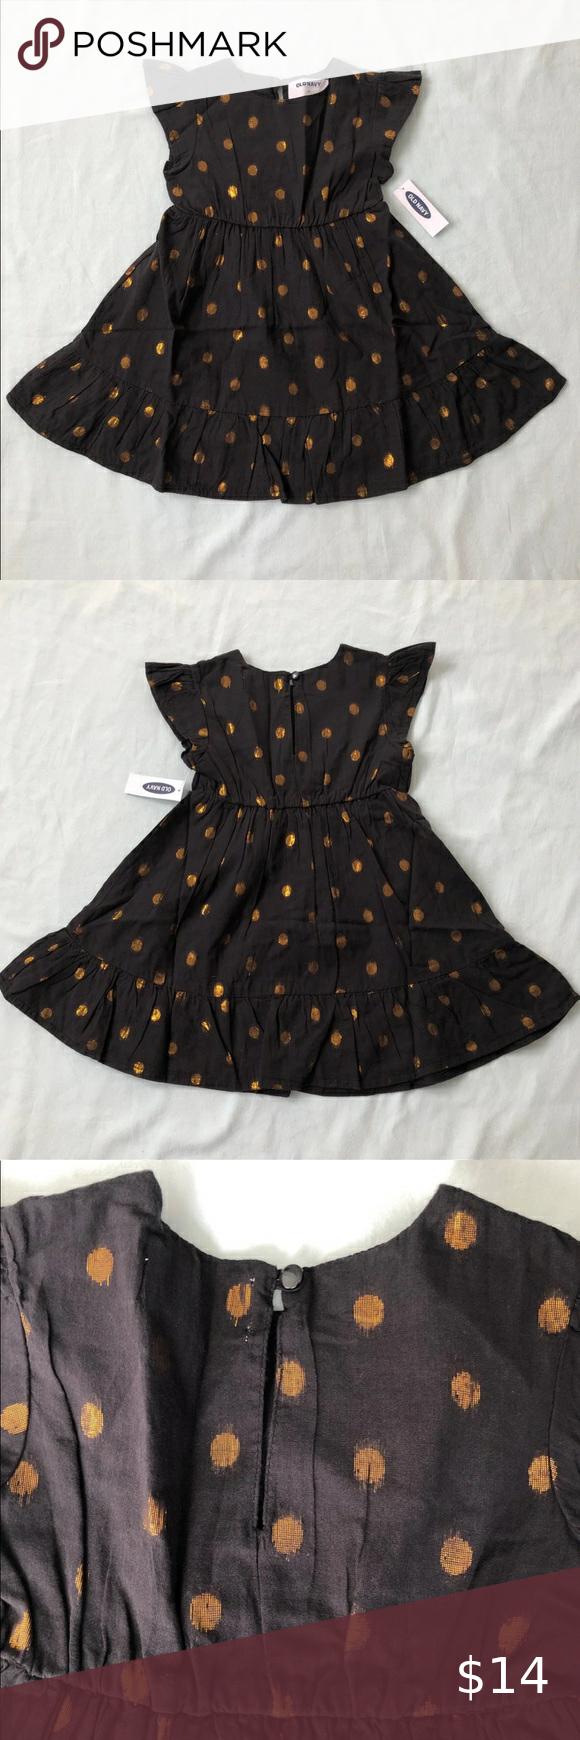 Nwt 4t Girl Polka Dot Ruffled Black Dress Black Ruffle Dress Girl Outfits Old Navy Toddler Girl [ 1740 x 580 Pixel ]